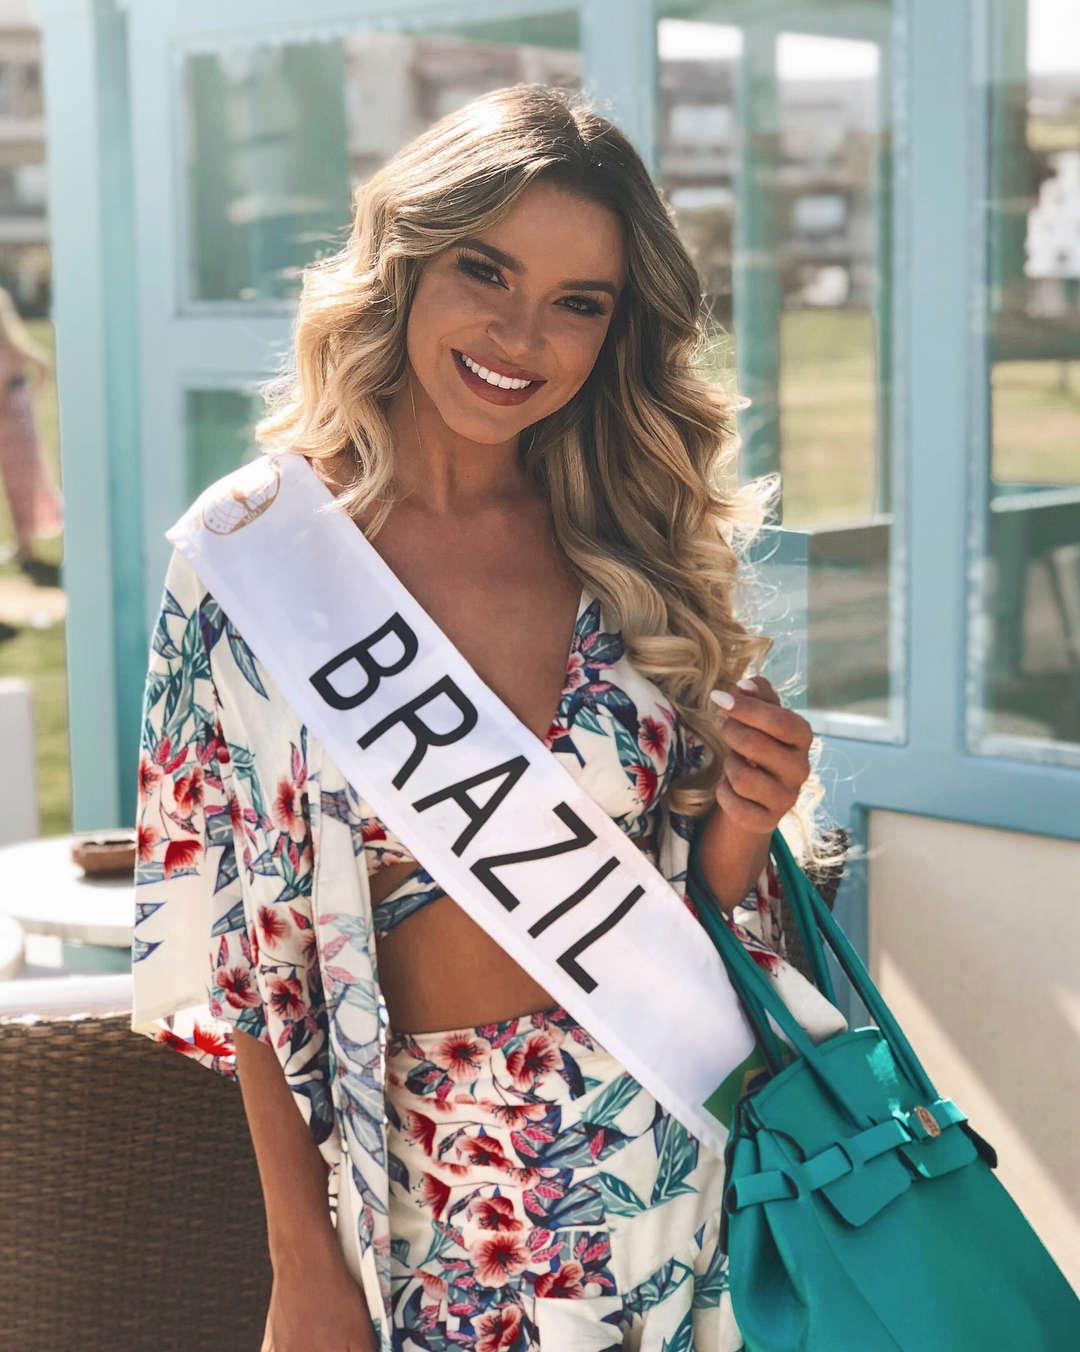 amanda cardoso, miss grand espirito santo 2019/3rd runner-up de miss intercontinental 2017. - Página 5 26340010